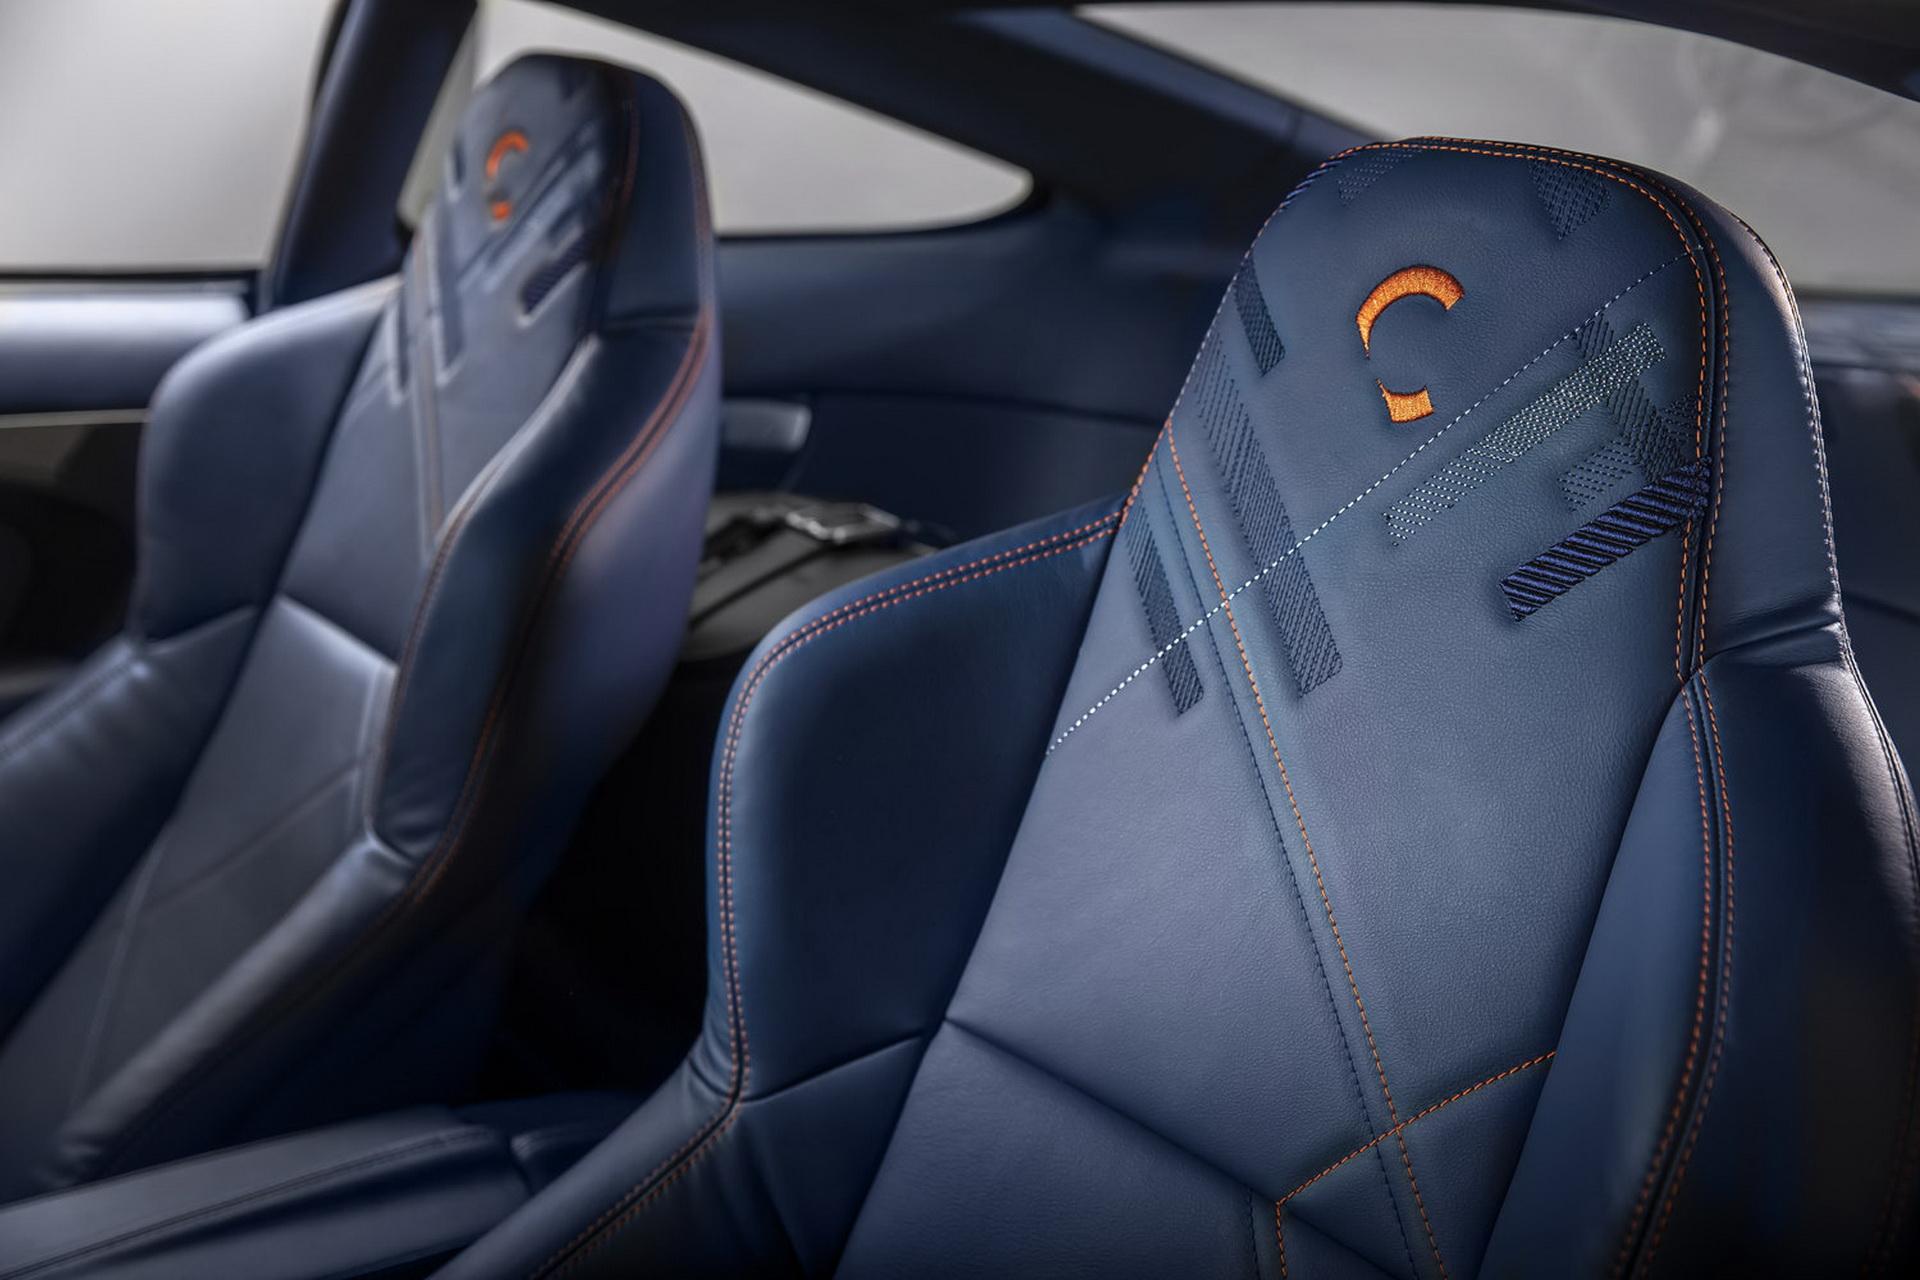 Aston Martin Vanquish 25 Seats